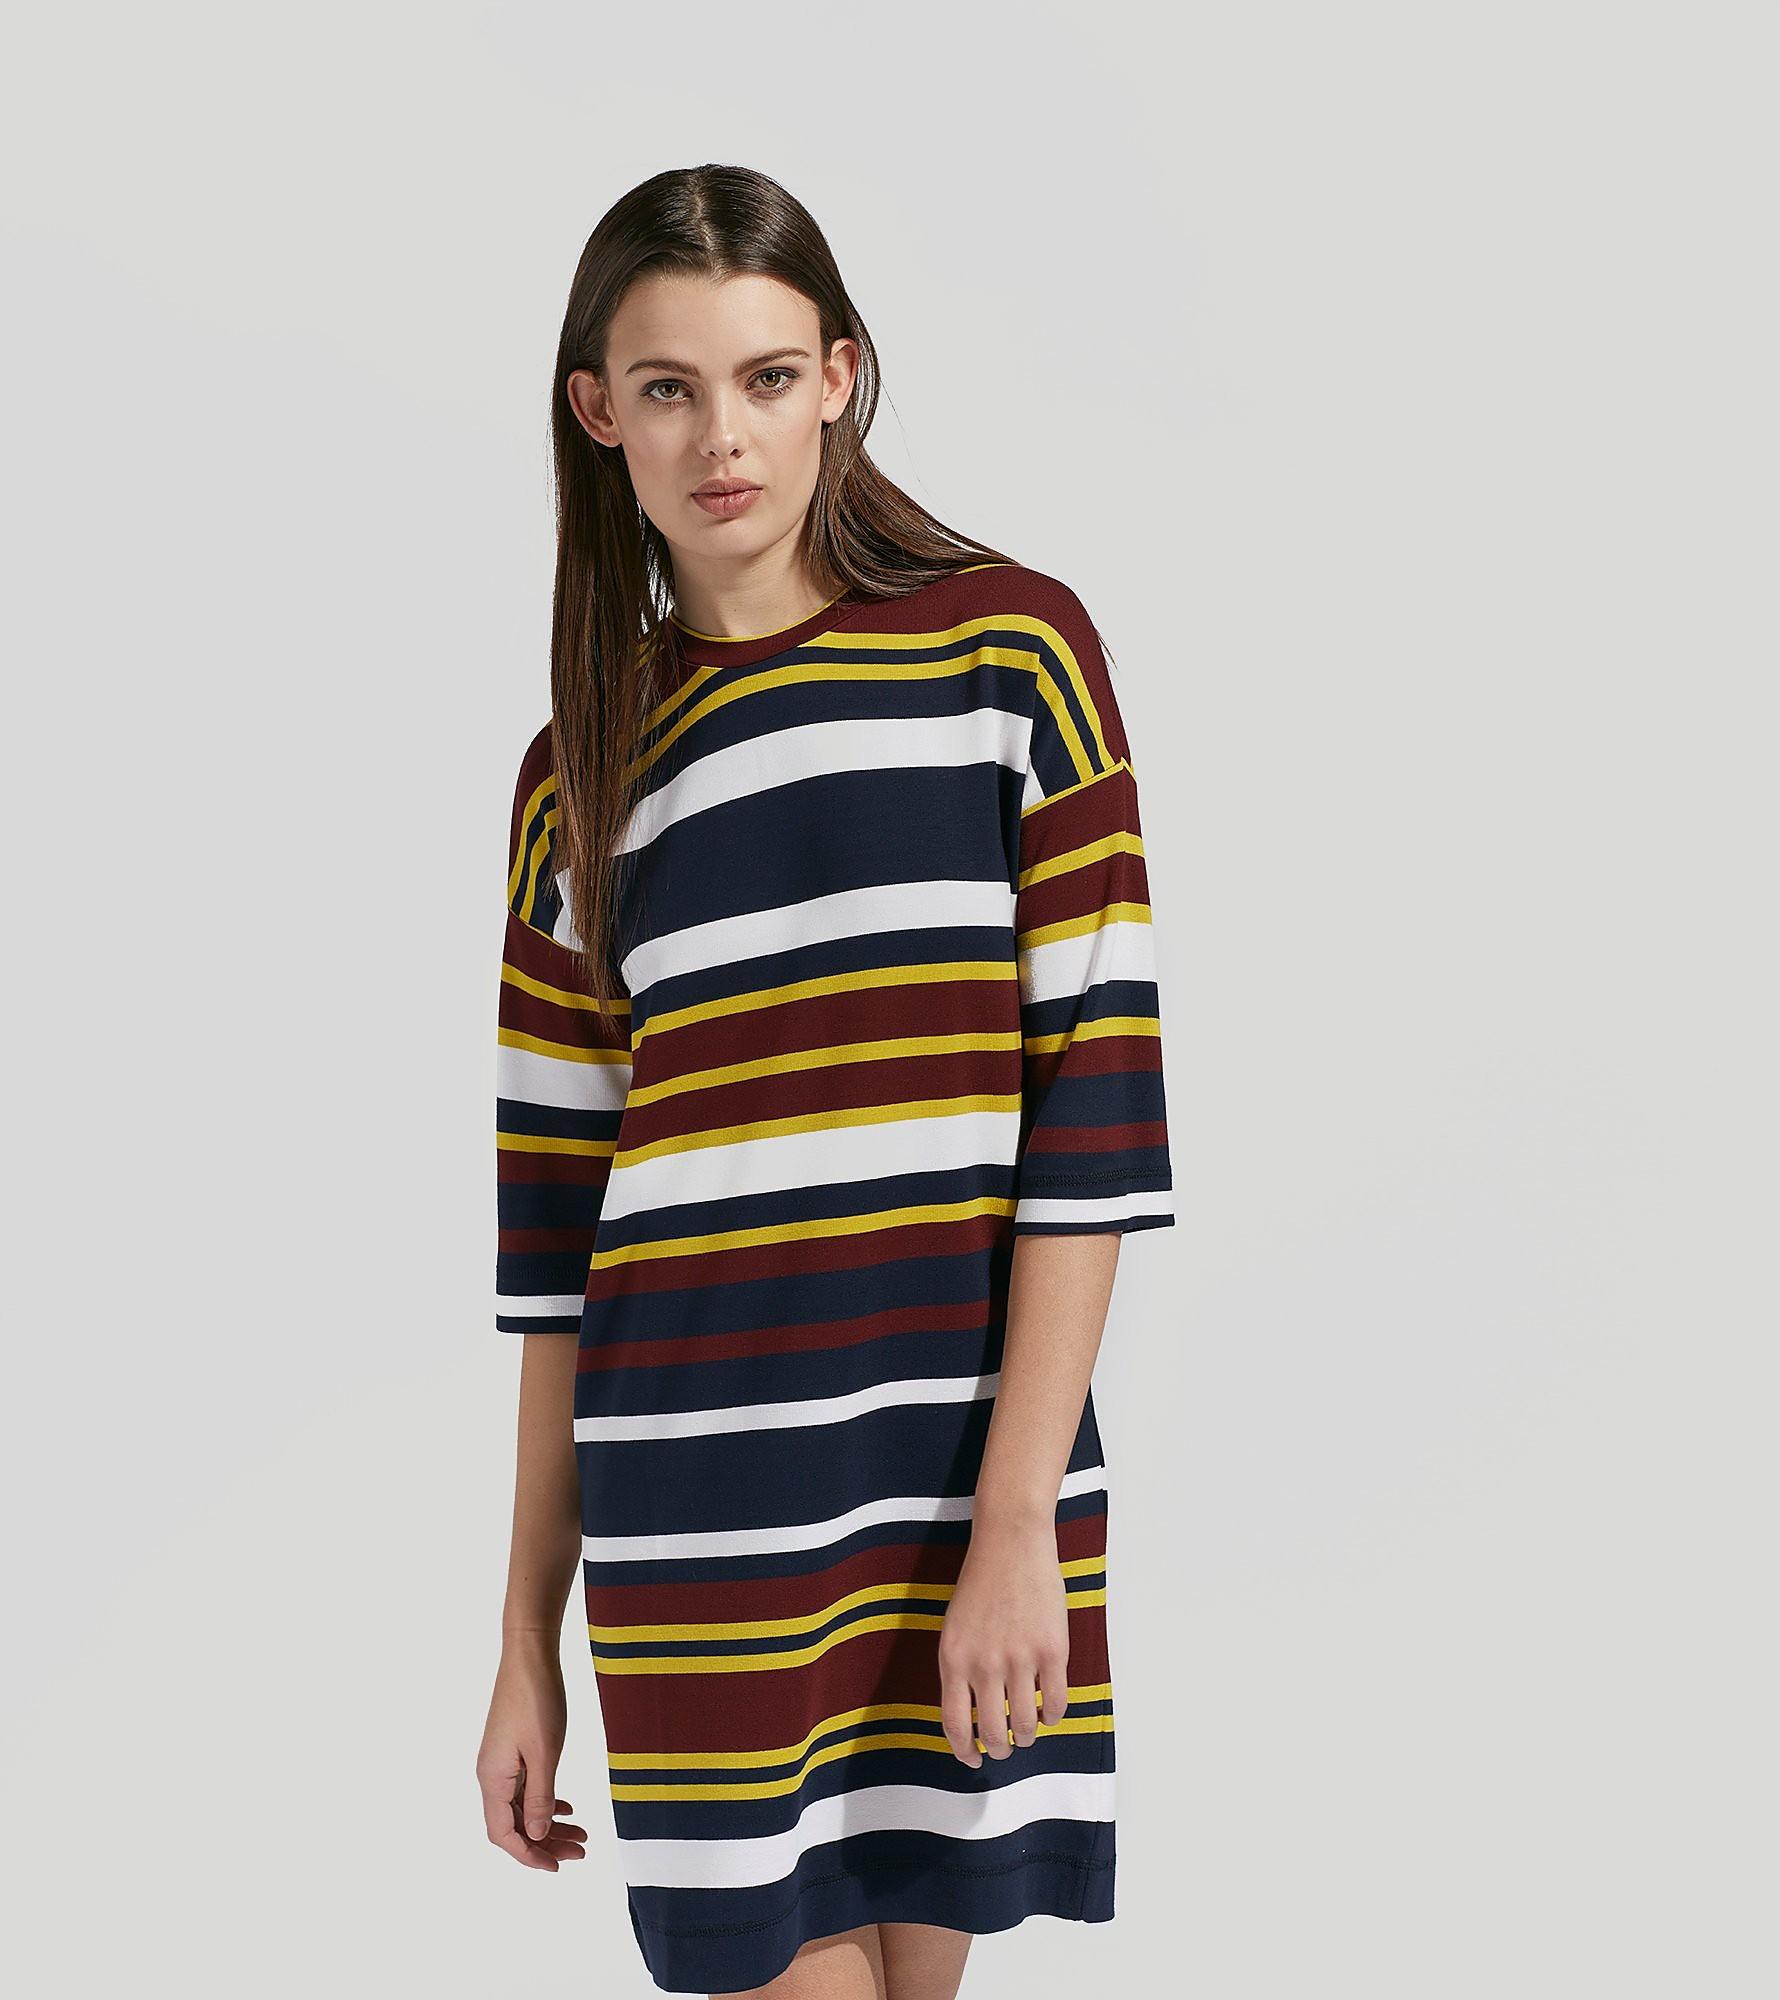 LIBERTINE-LIBERTINE Timbre Stripe Dress